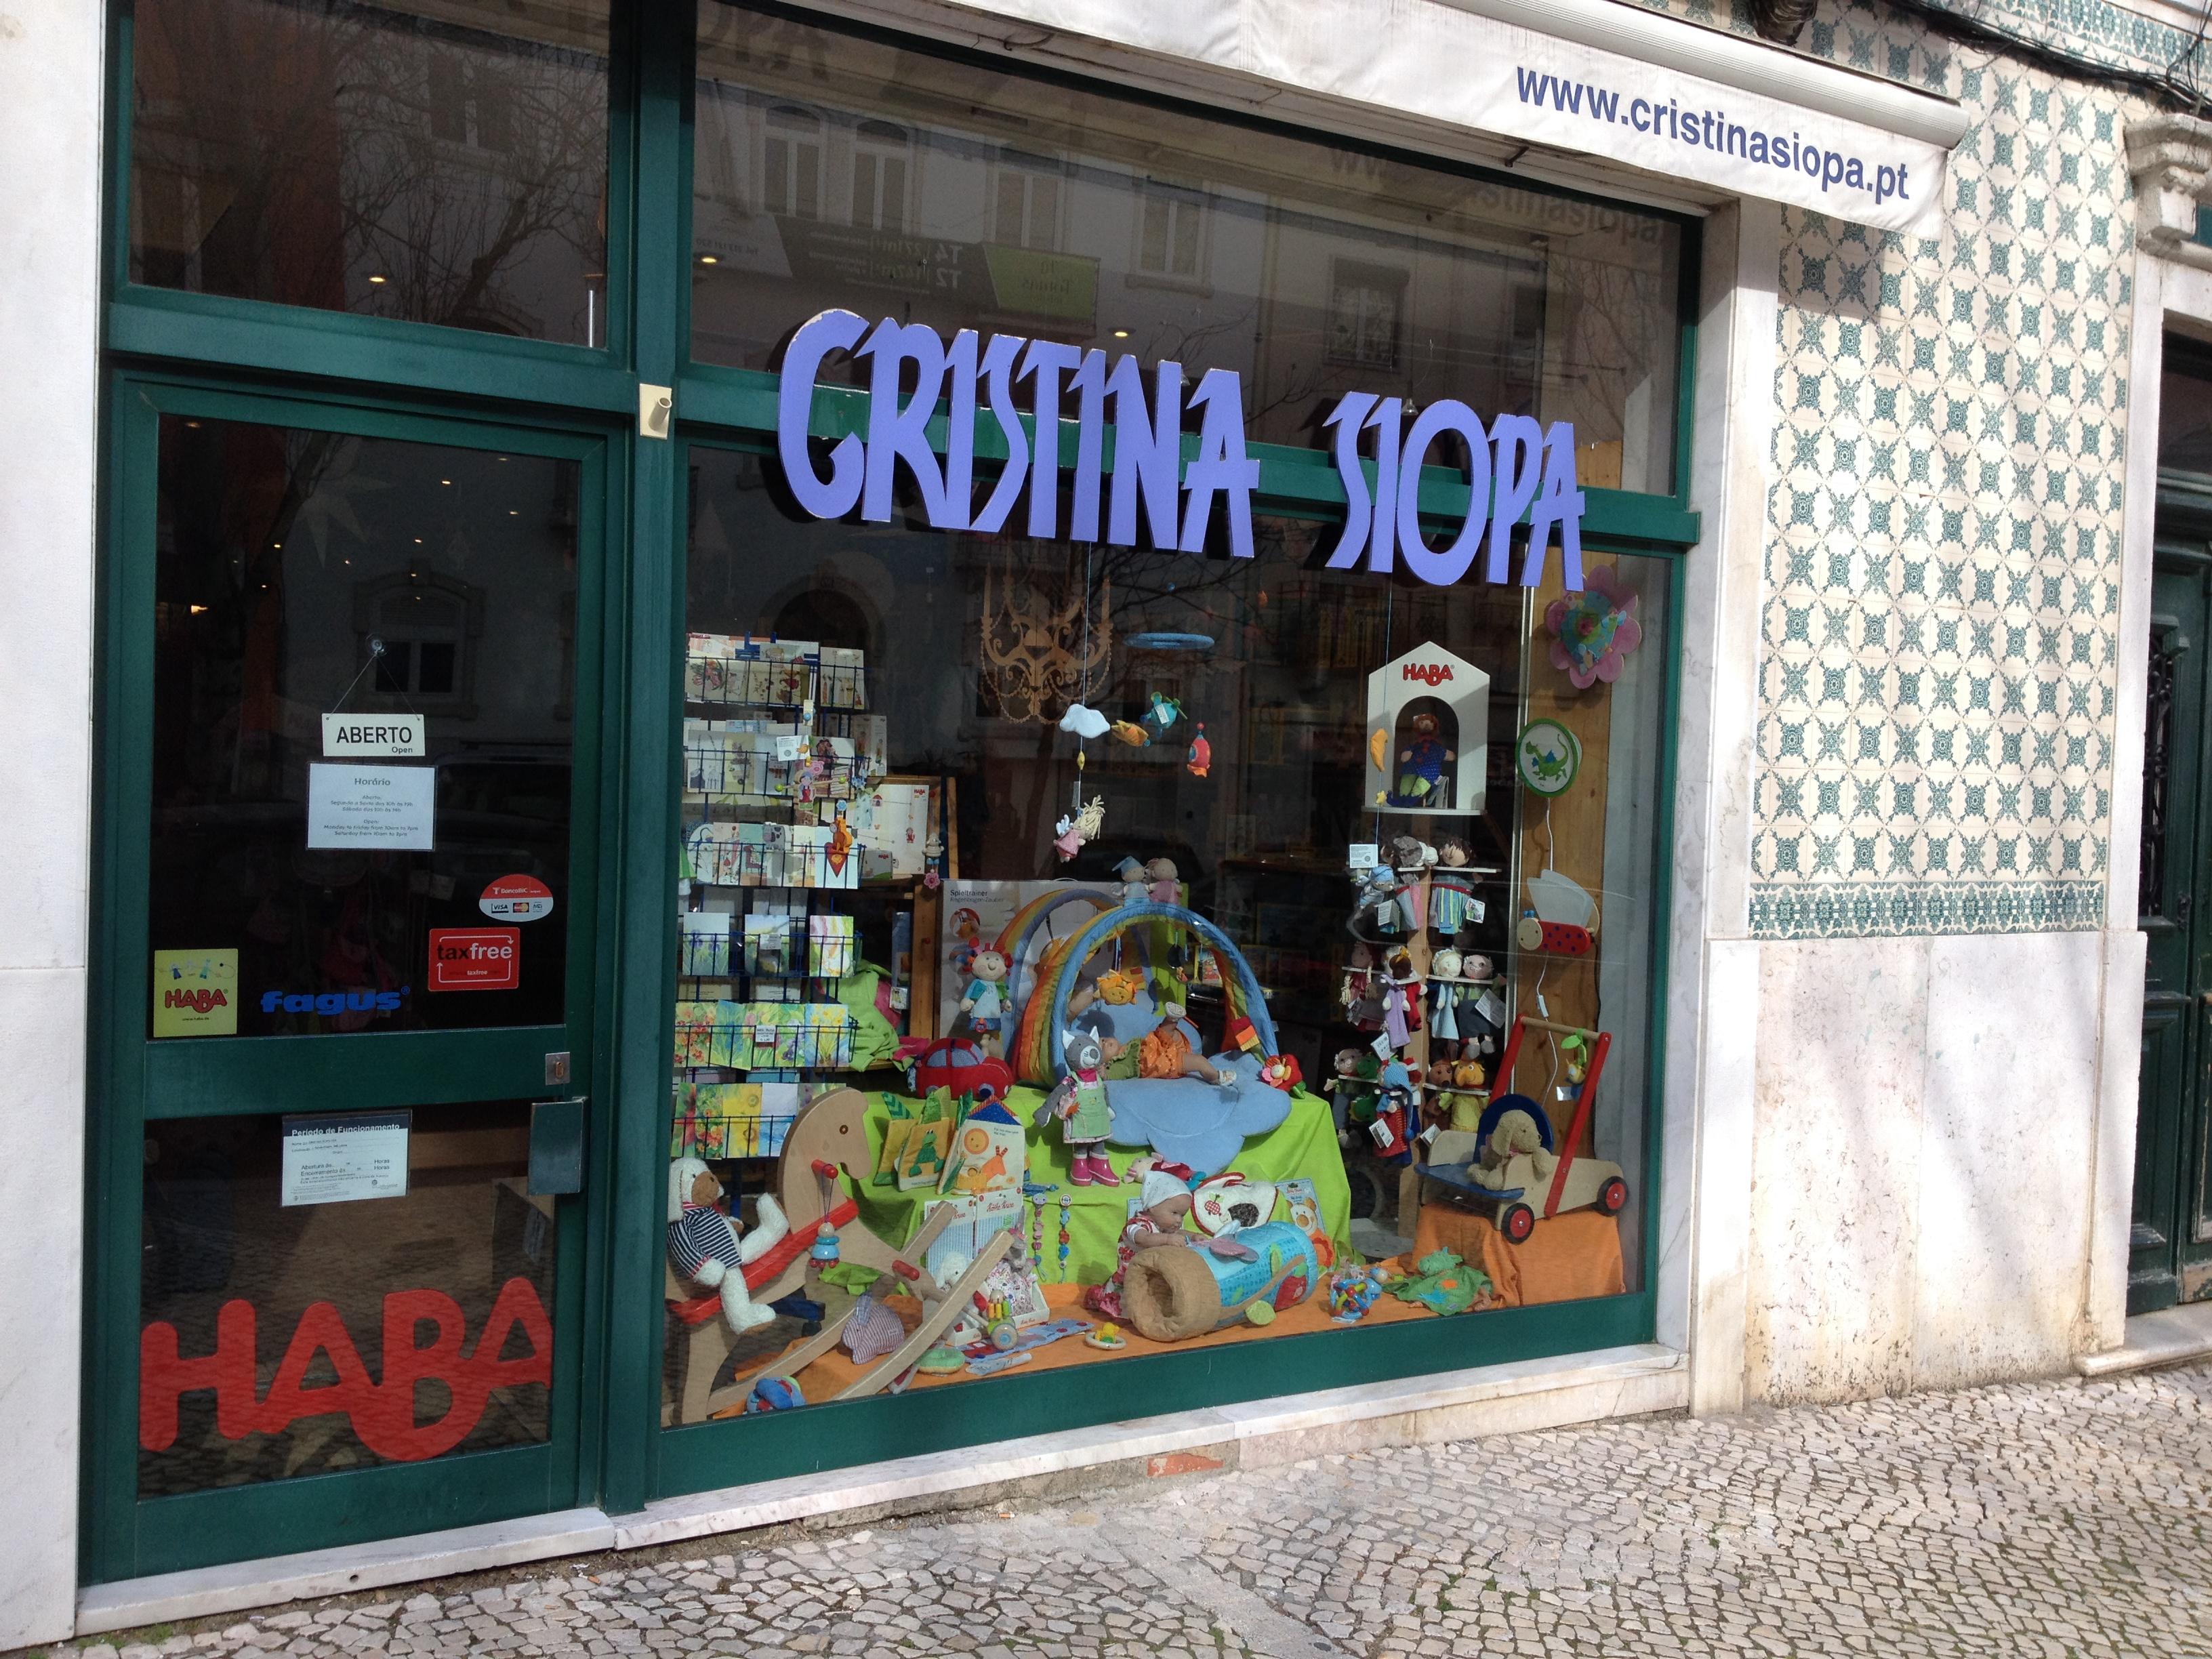 Cristina Siopa, LDA - Brinquedos e Mobil